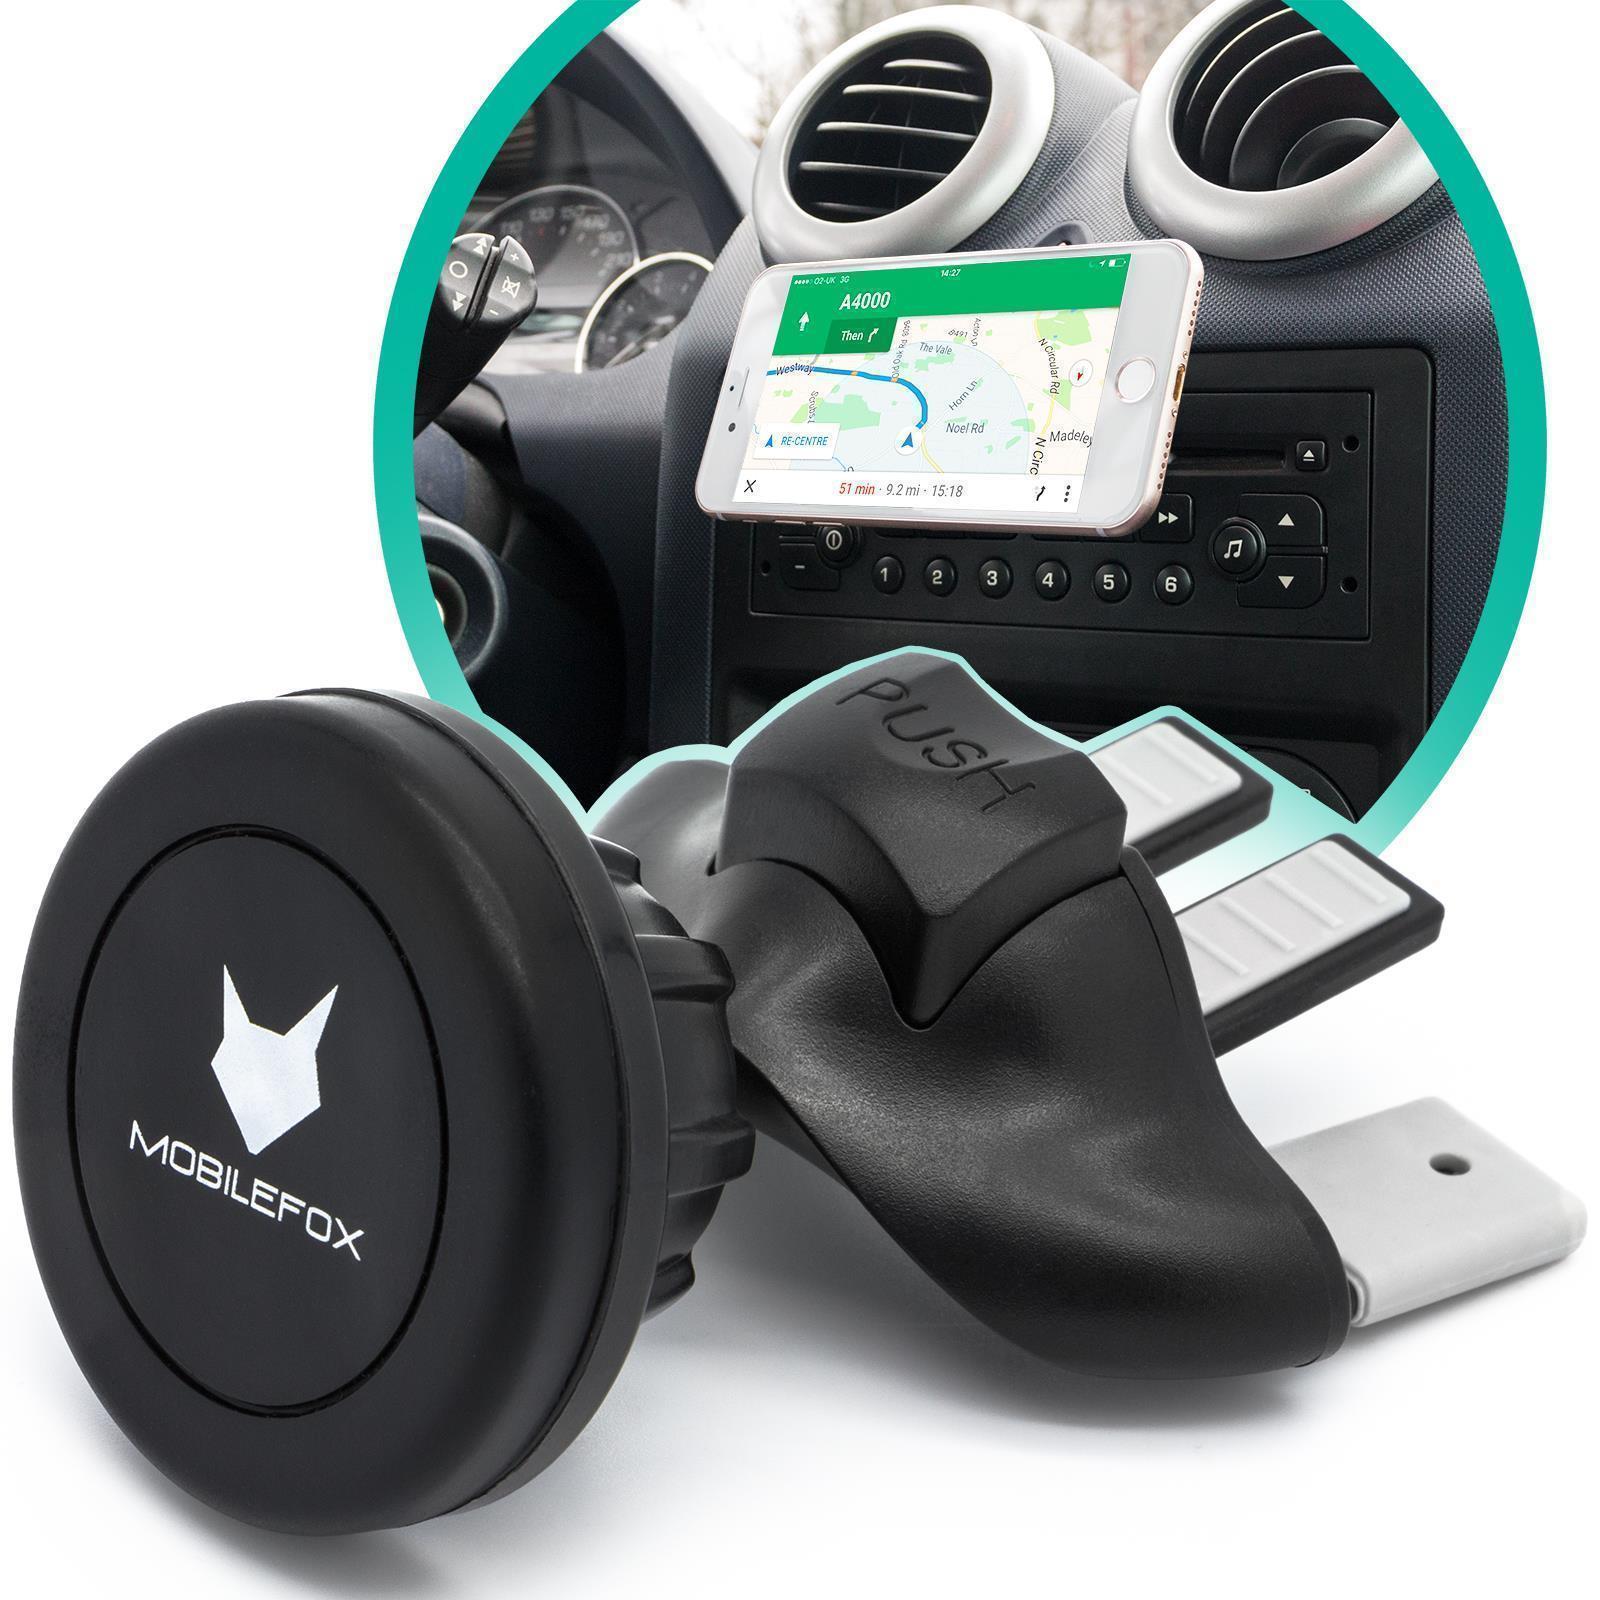 mobilefox 360 magnet cd schlitz kfz halterung auto handy. Black Bedroom Furniture Sets. Home Design Ideas